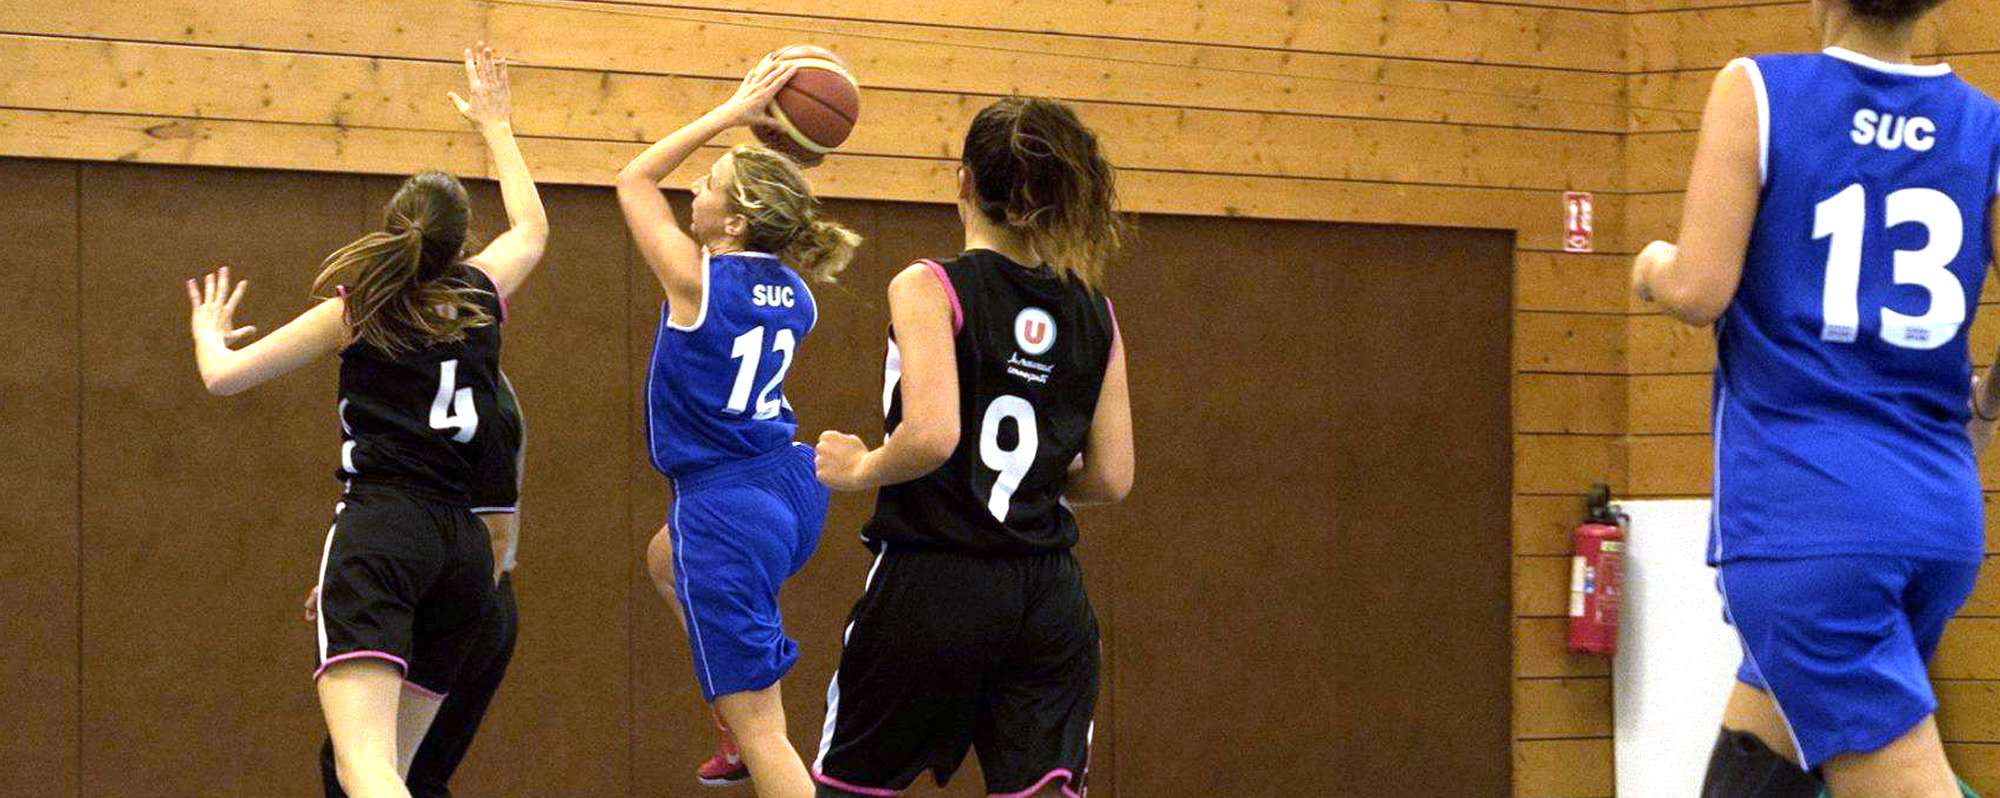 SUC Basket-ball